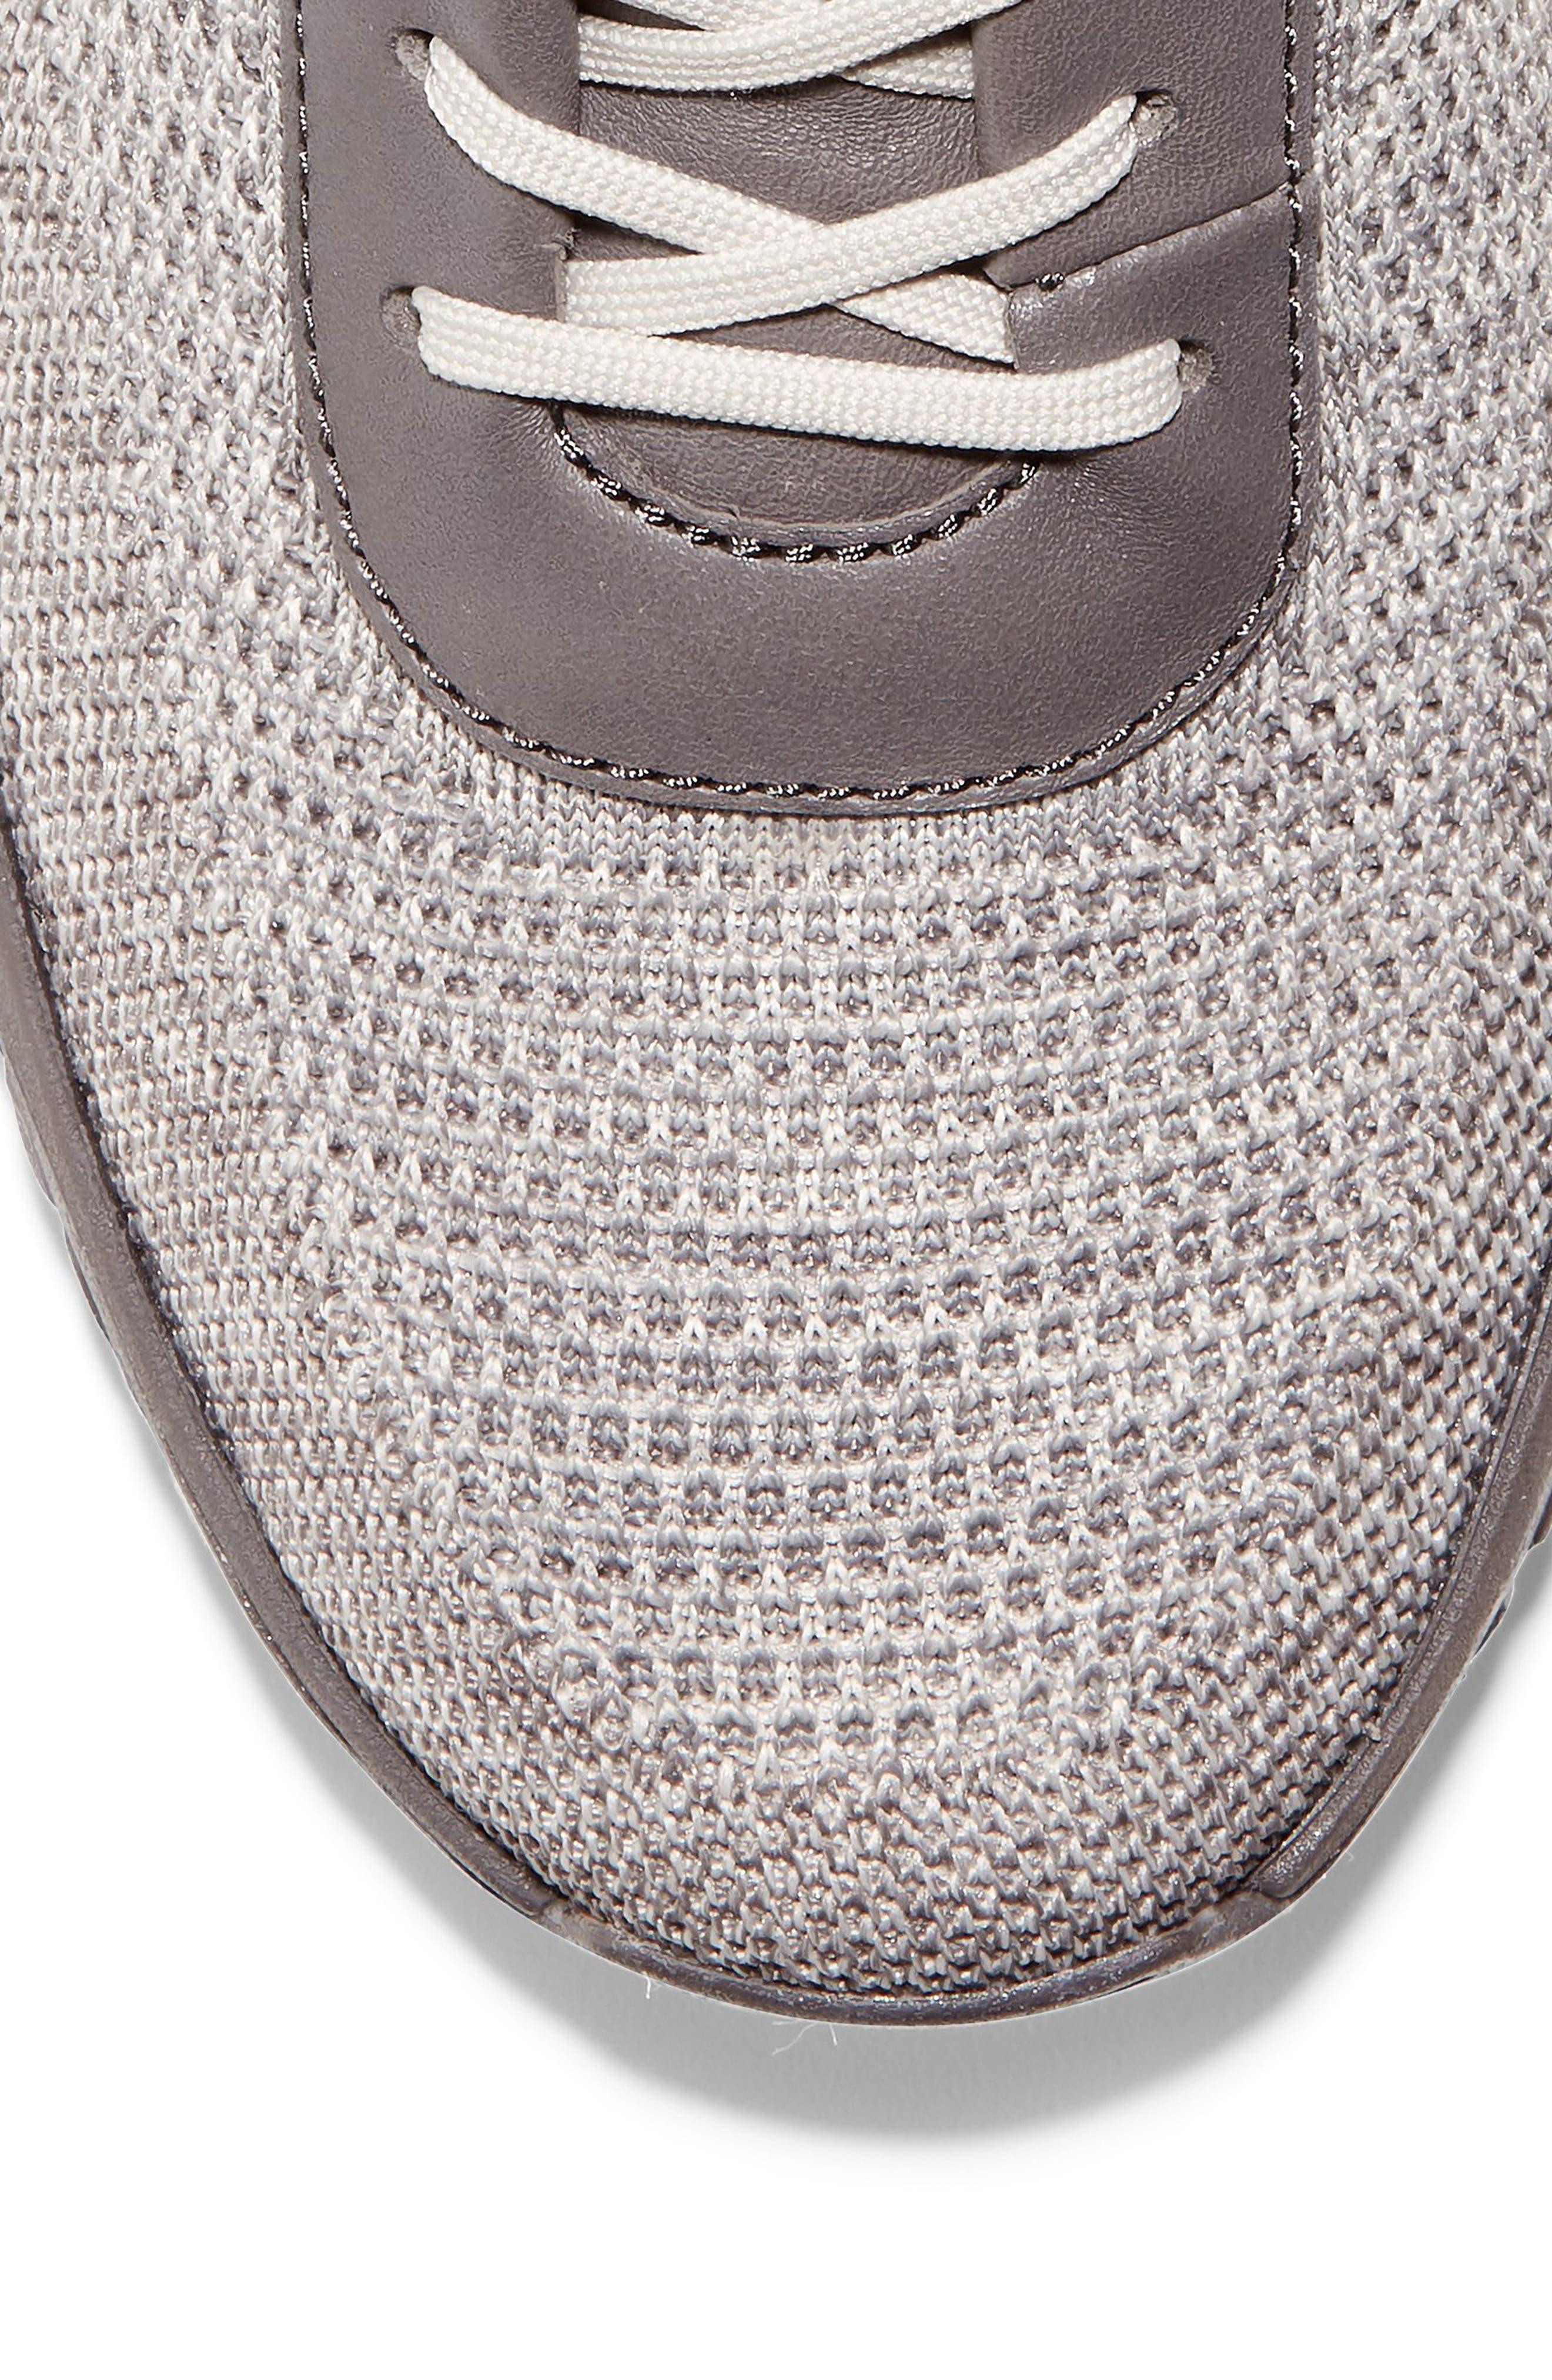 GrandPro Trail Low Stitchlite Sneaker,                             Alternate thumbnail 7, color,                             BLACK/ VAPOR GREY KNIT